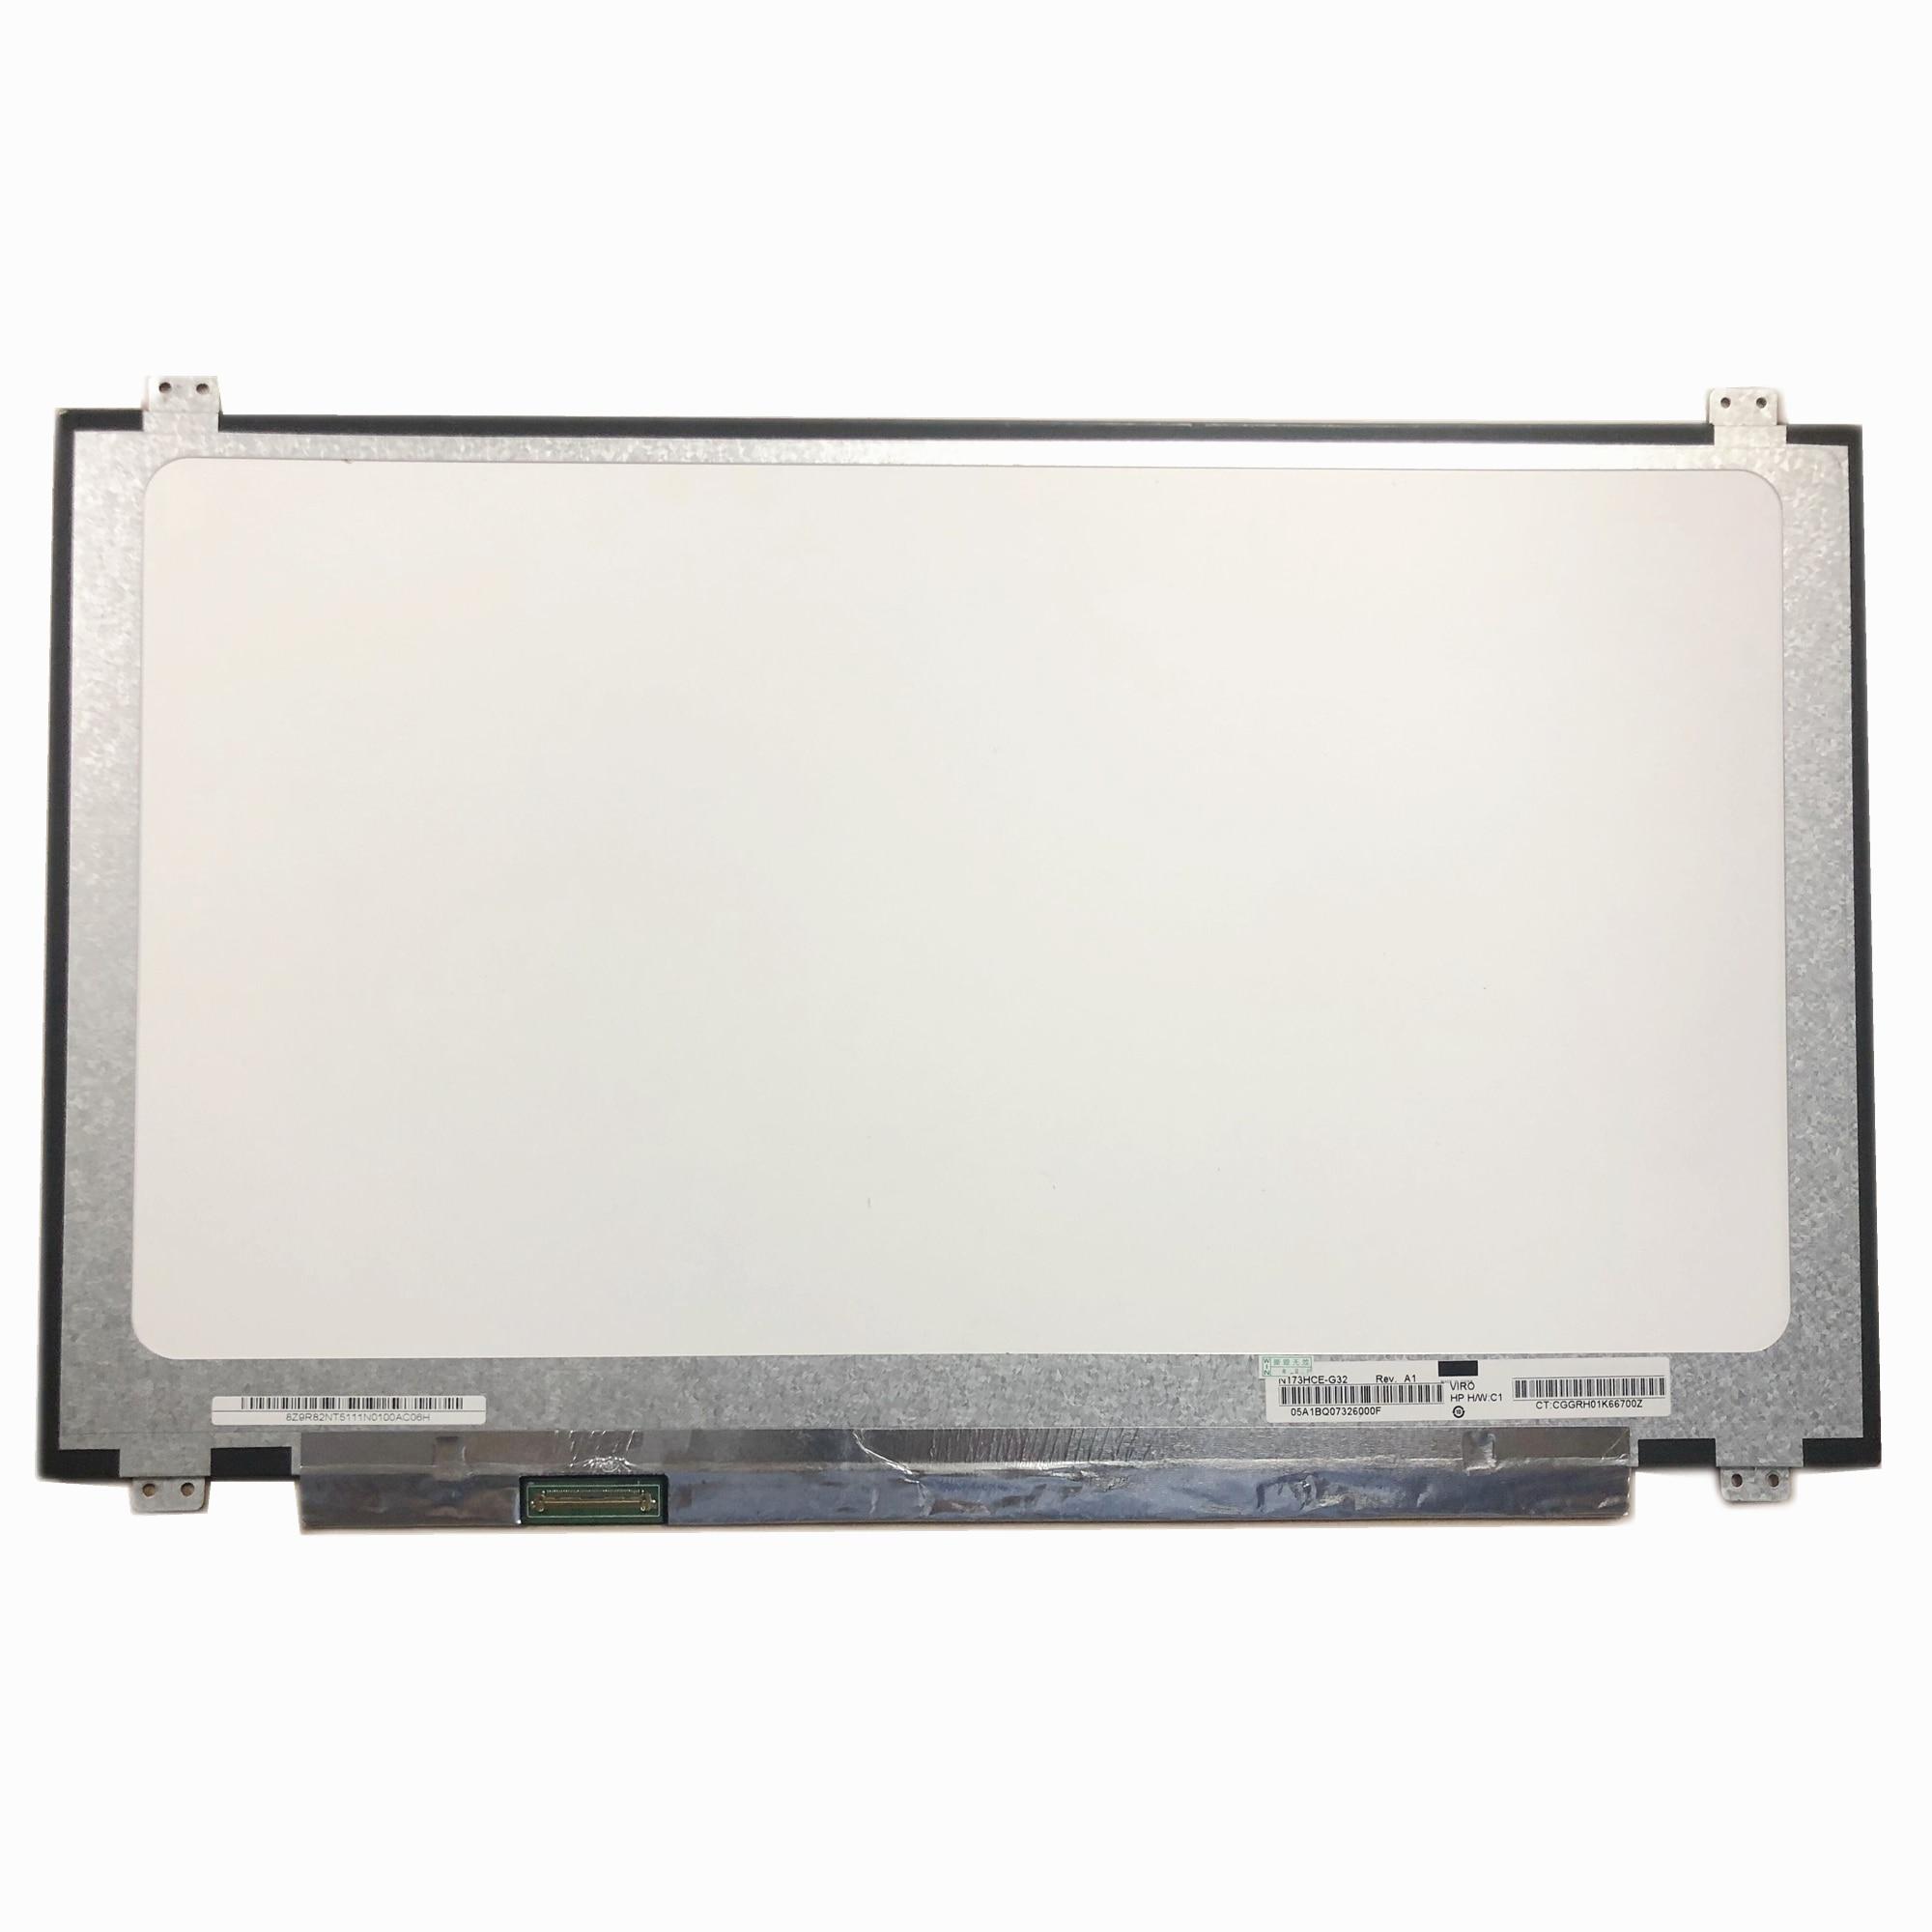 Envío Gratis N173HCE-G32 N173HCE G32 ajuste B173HAN01.1 B173HAN01.4 pantalla Lcd de ordenador portátil 1920*1080 EDP 40 pines IPS